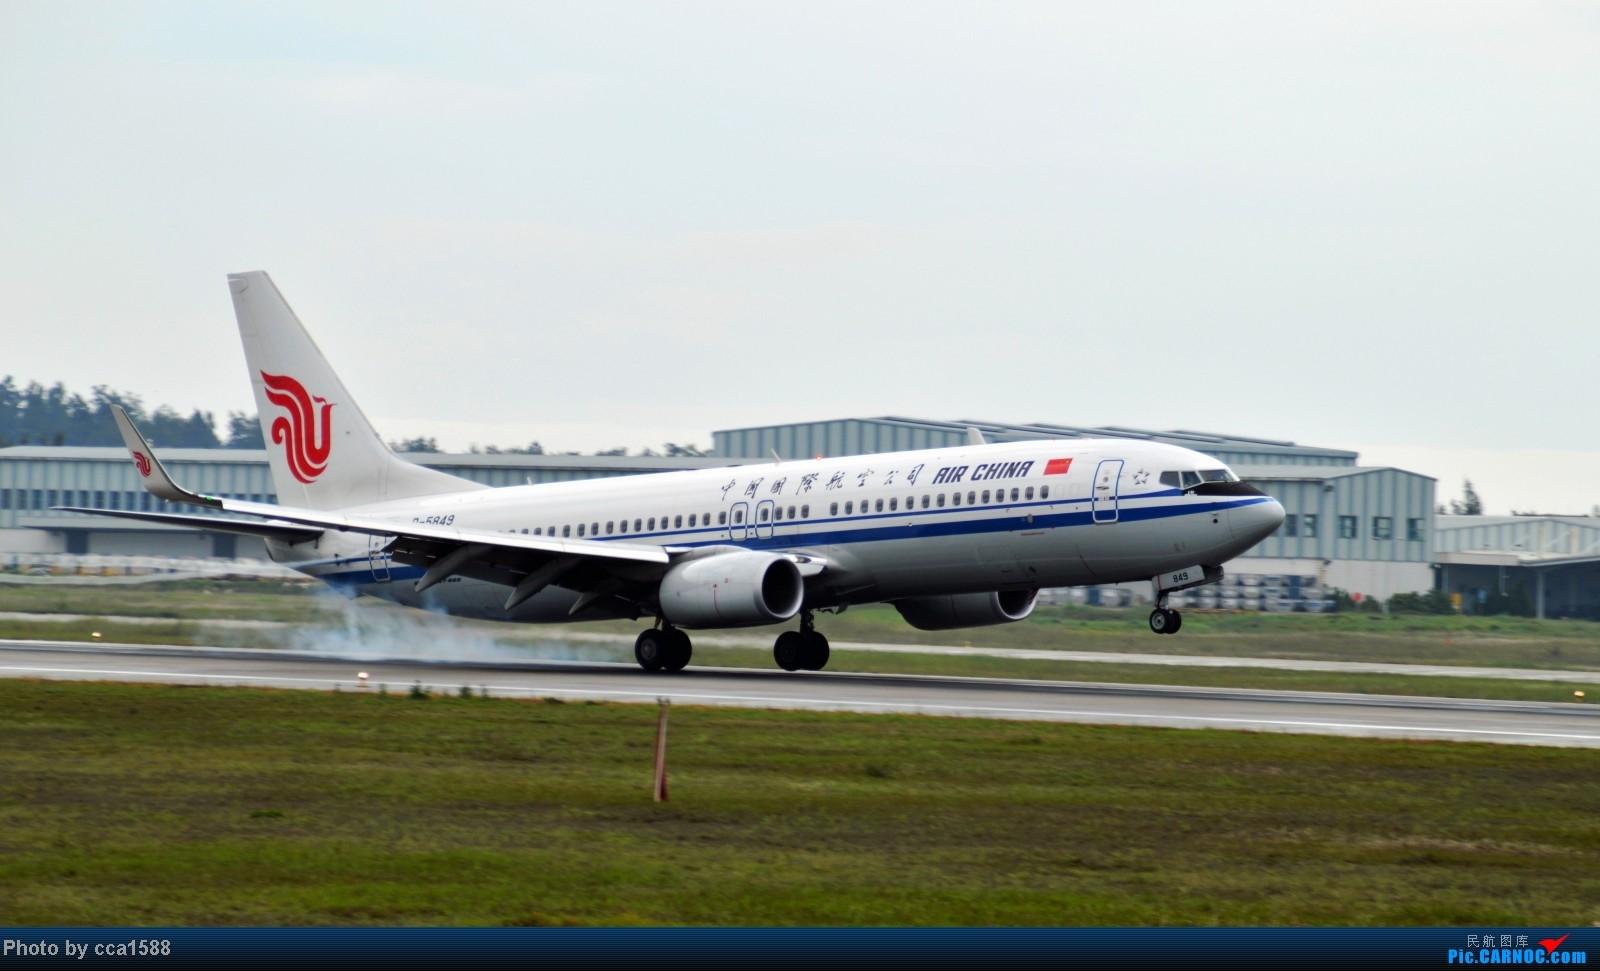 Re:[原创]4.26FOC拍机--烂天出好机,各种奇葩货~~ BOEING 737-800 B-5849 中国福州长乐机场